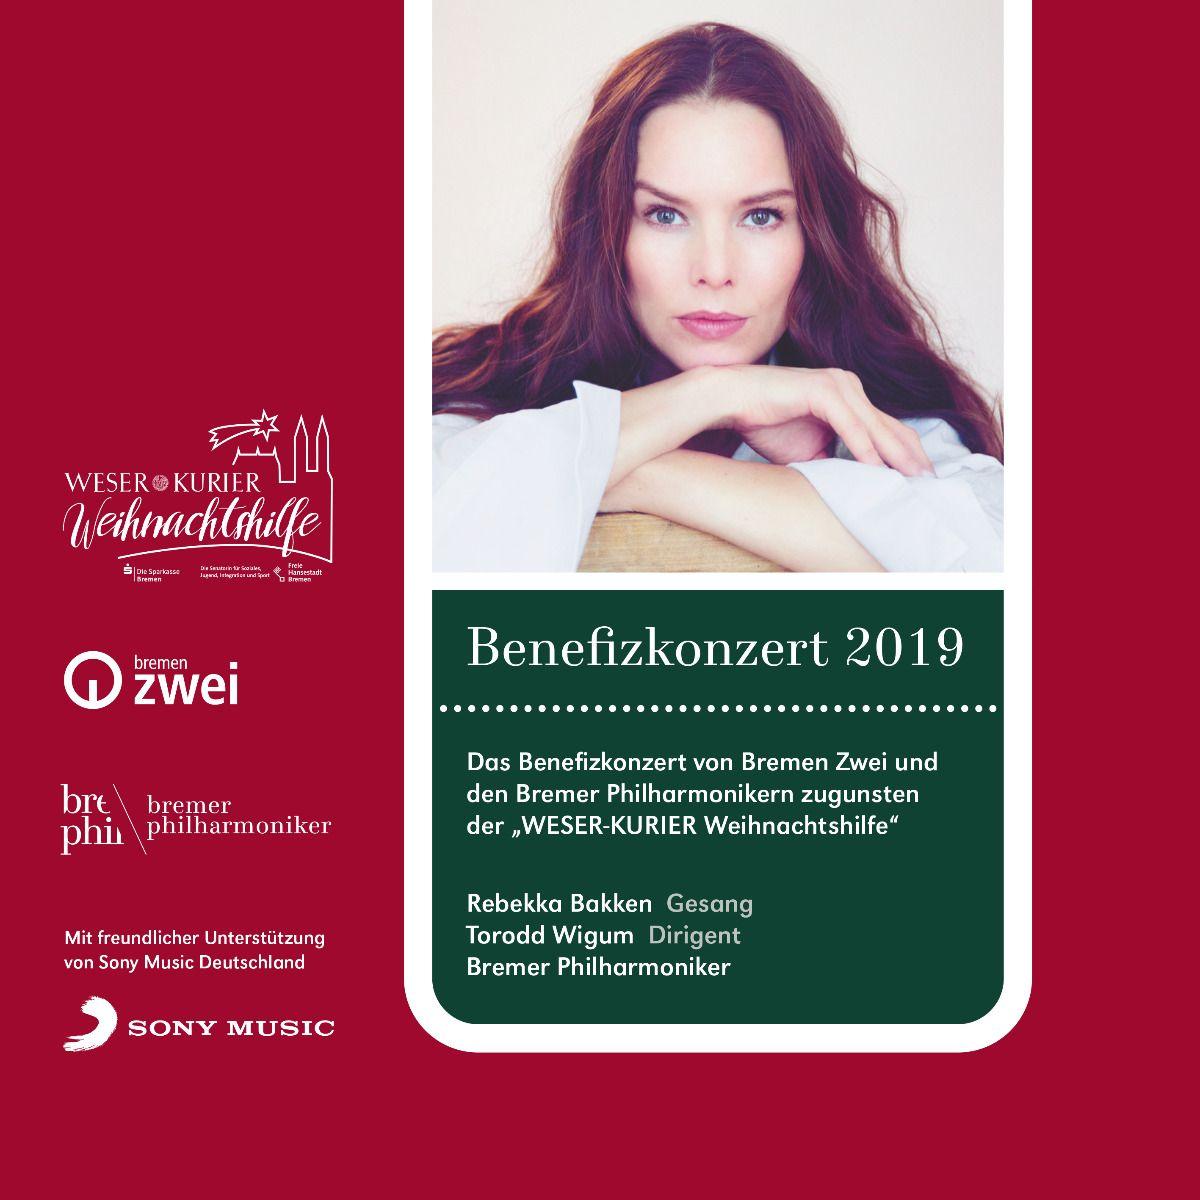 Benefizkonzert-2019-WESER-KURIER-Rebekka-Bakken